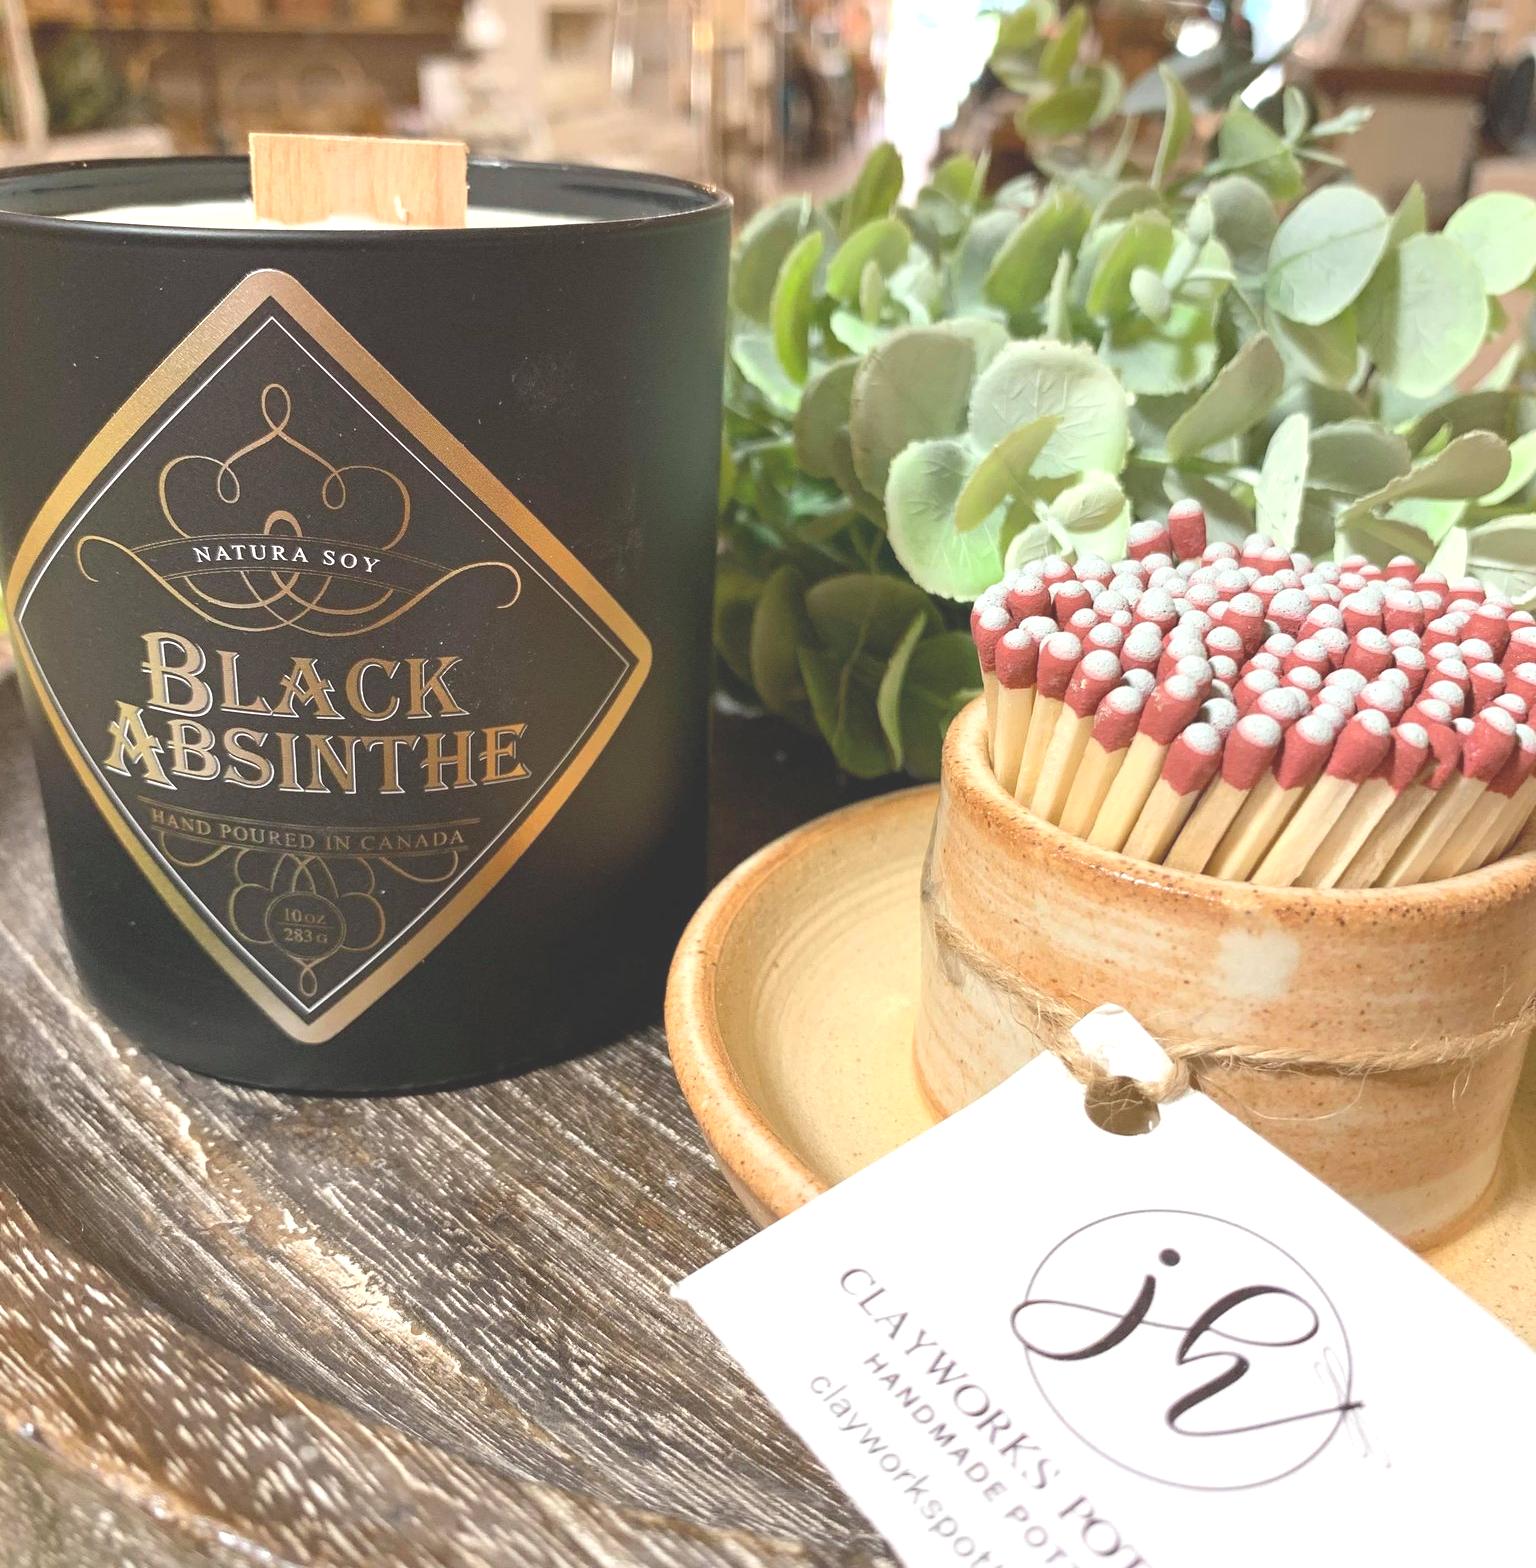 Black Absinthe Aniseed, Sweet Fennel and Bitter Orange.